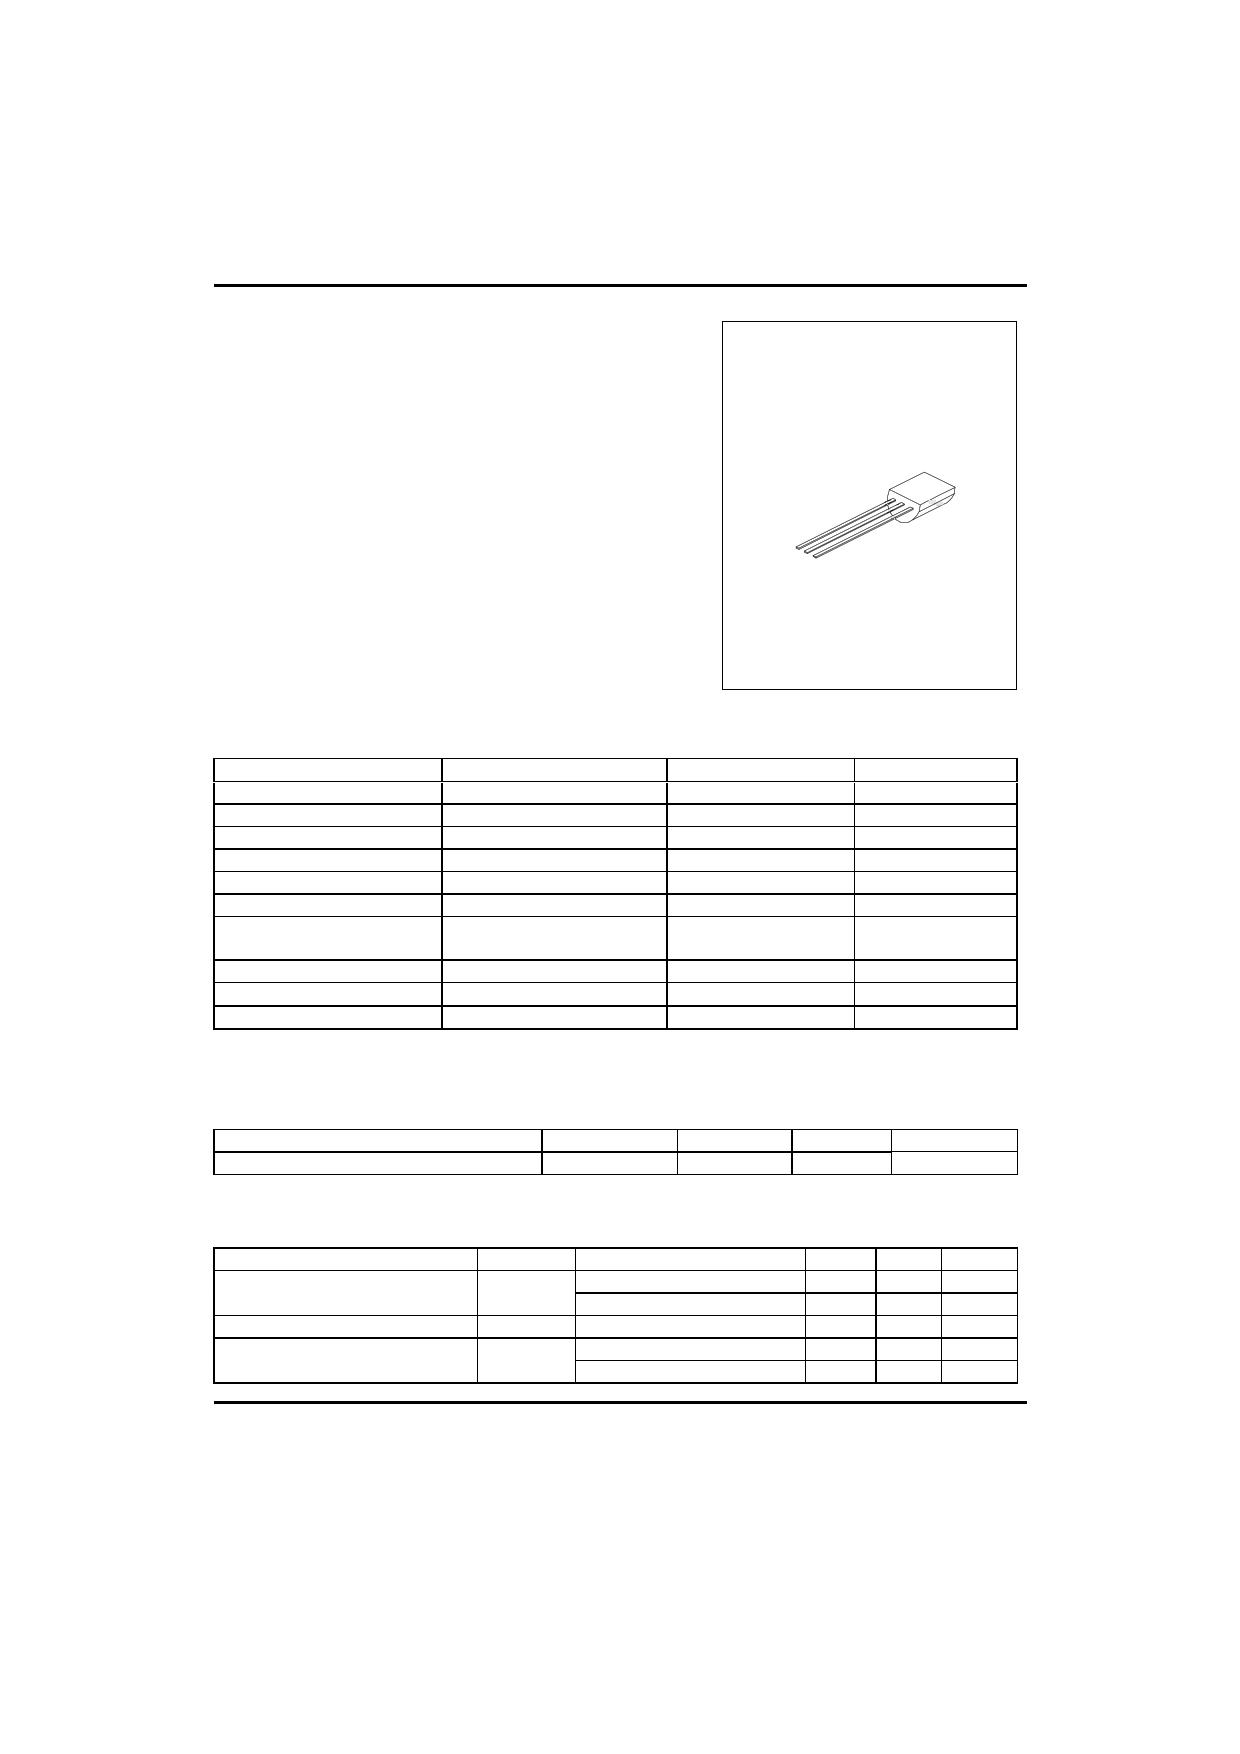 BF488 دیتاشیت PDF